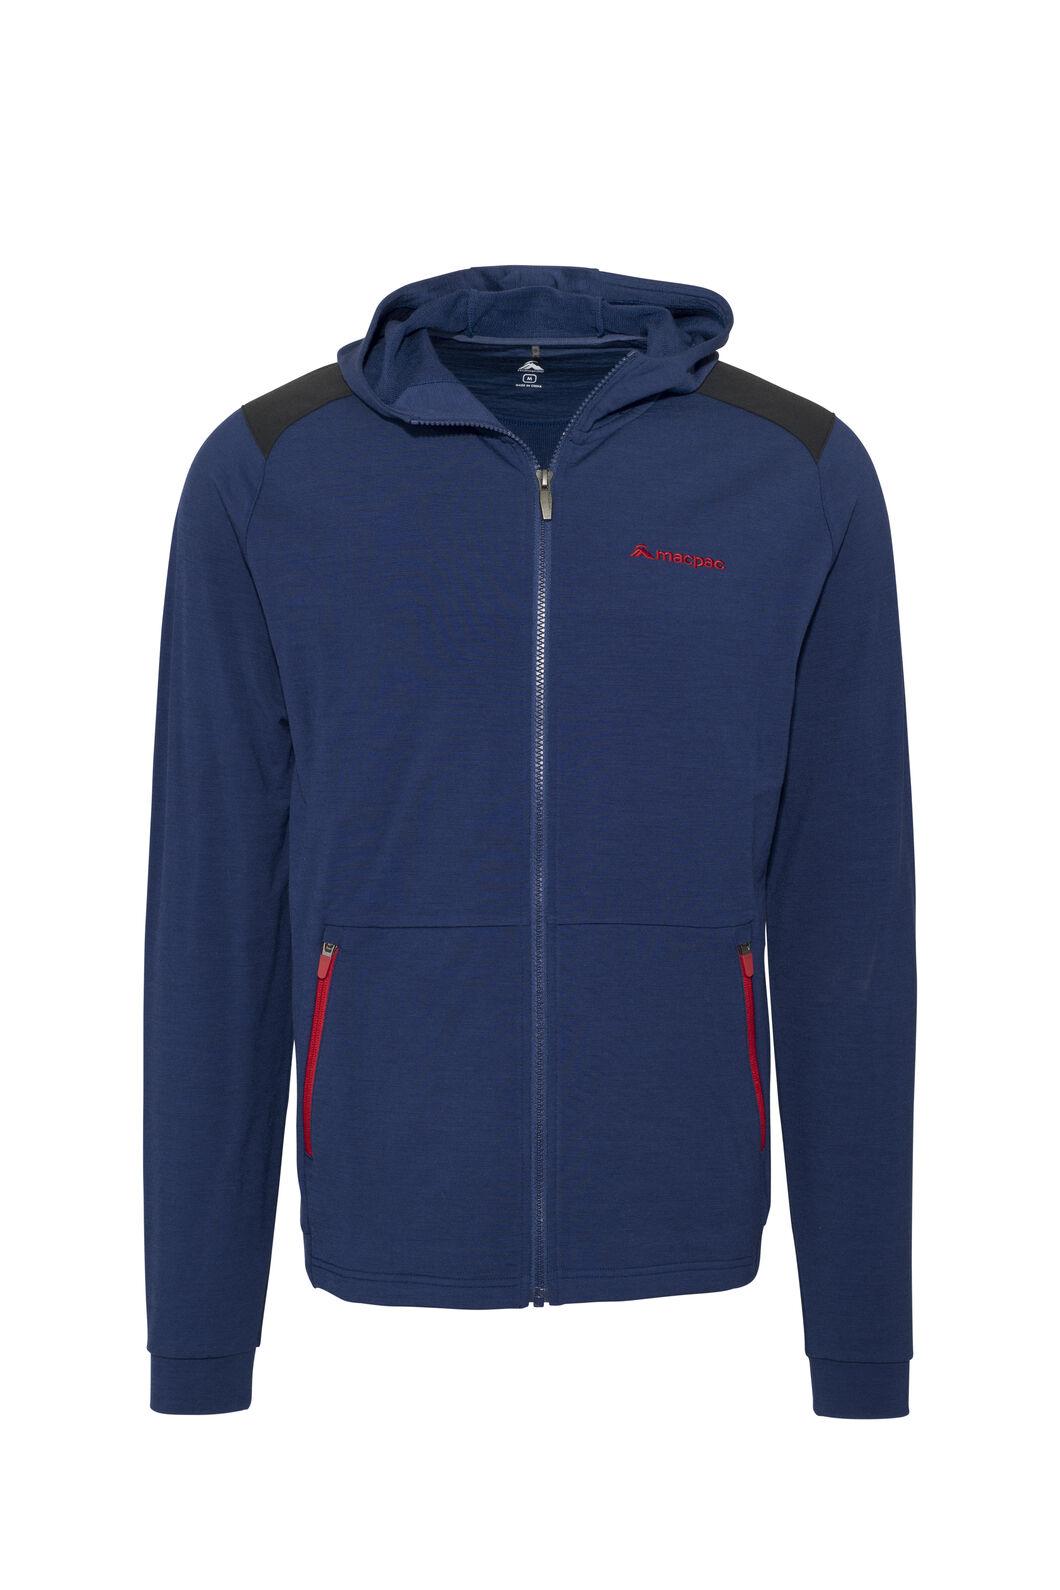 Macpac Men's Strata 280 Merino Hooded Jacket, Blueprint, hi-res